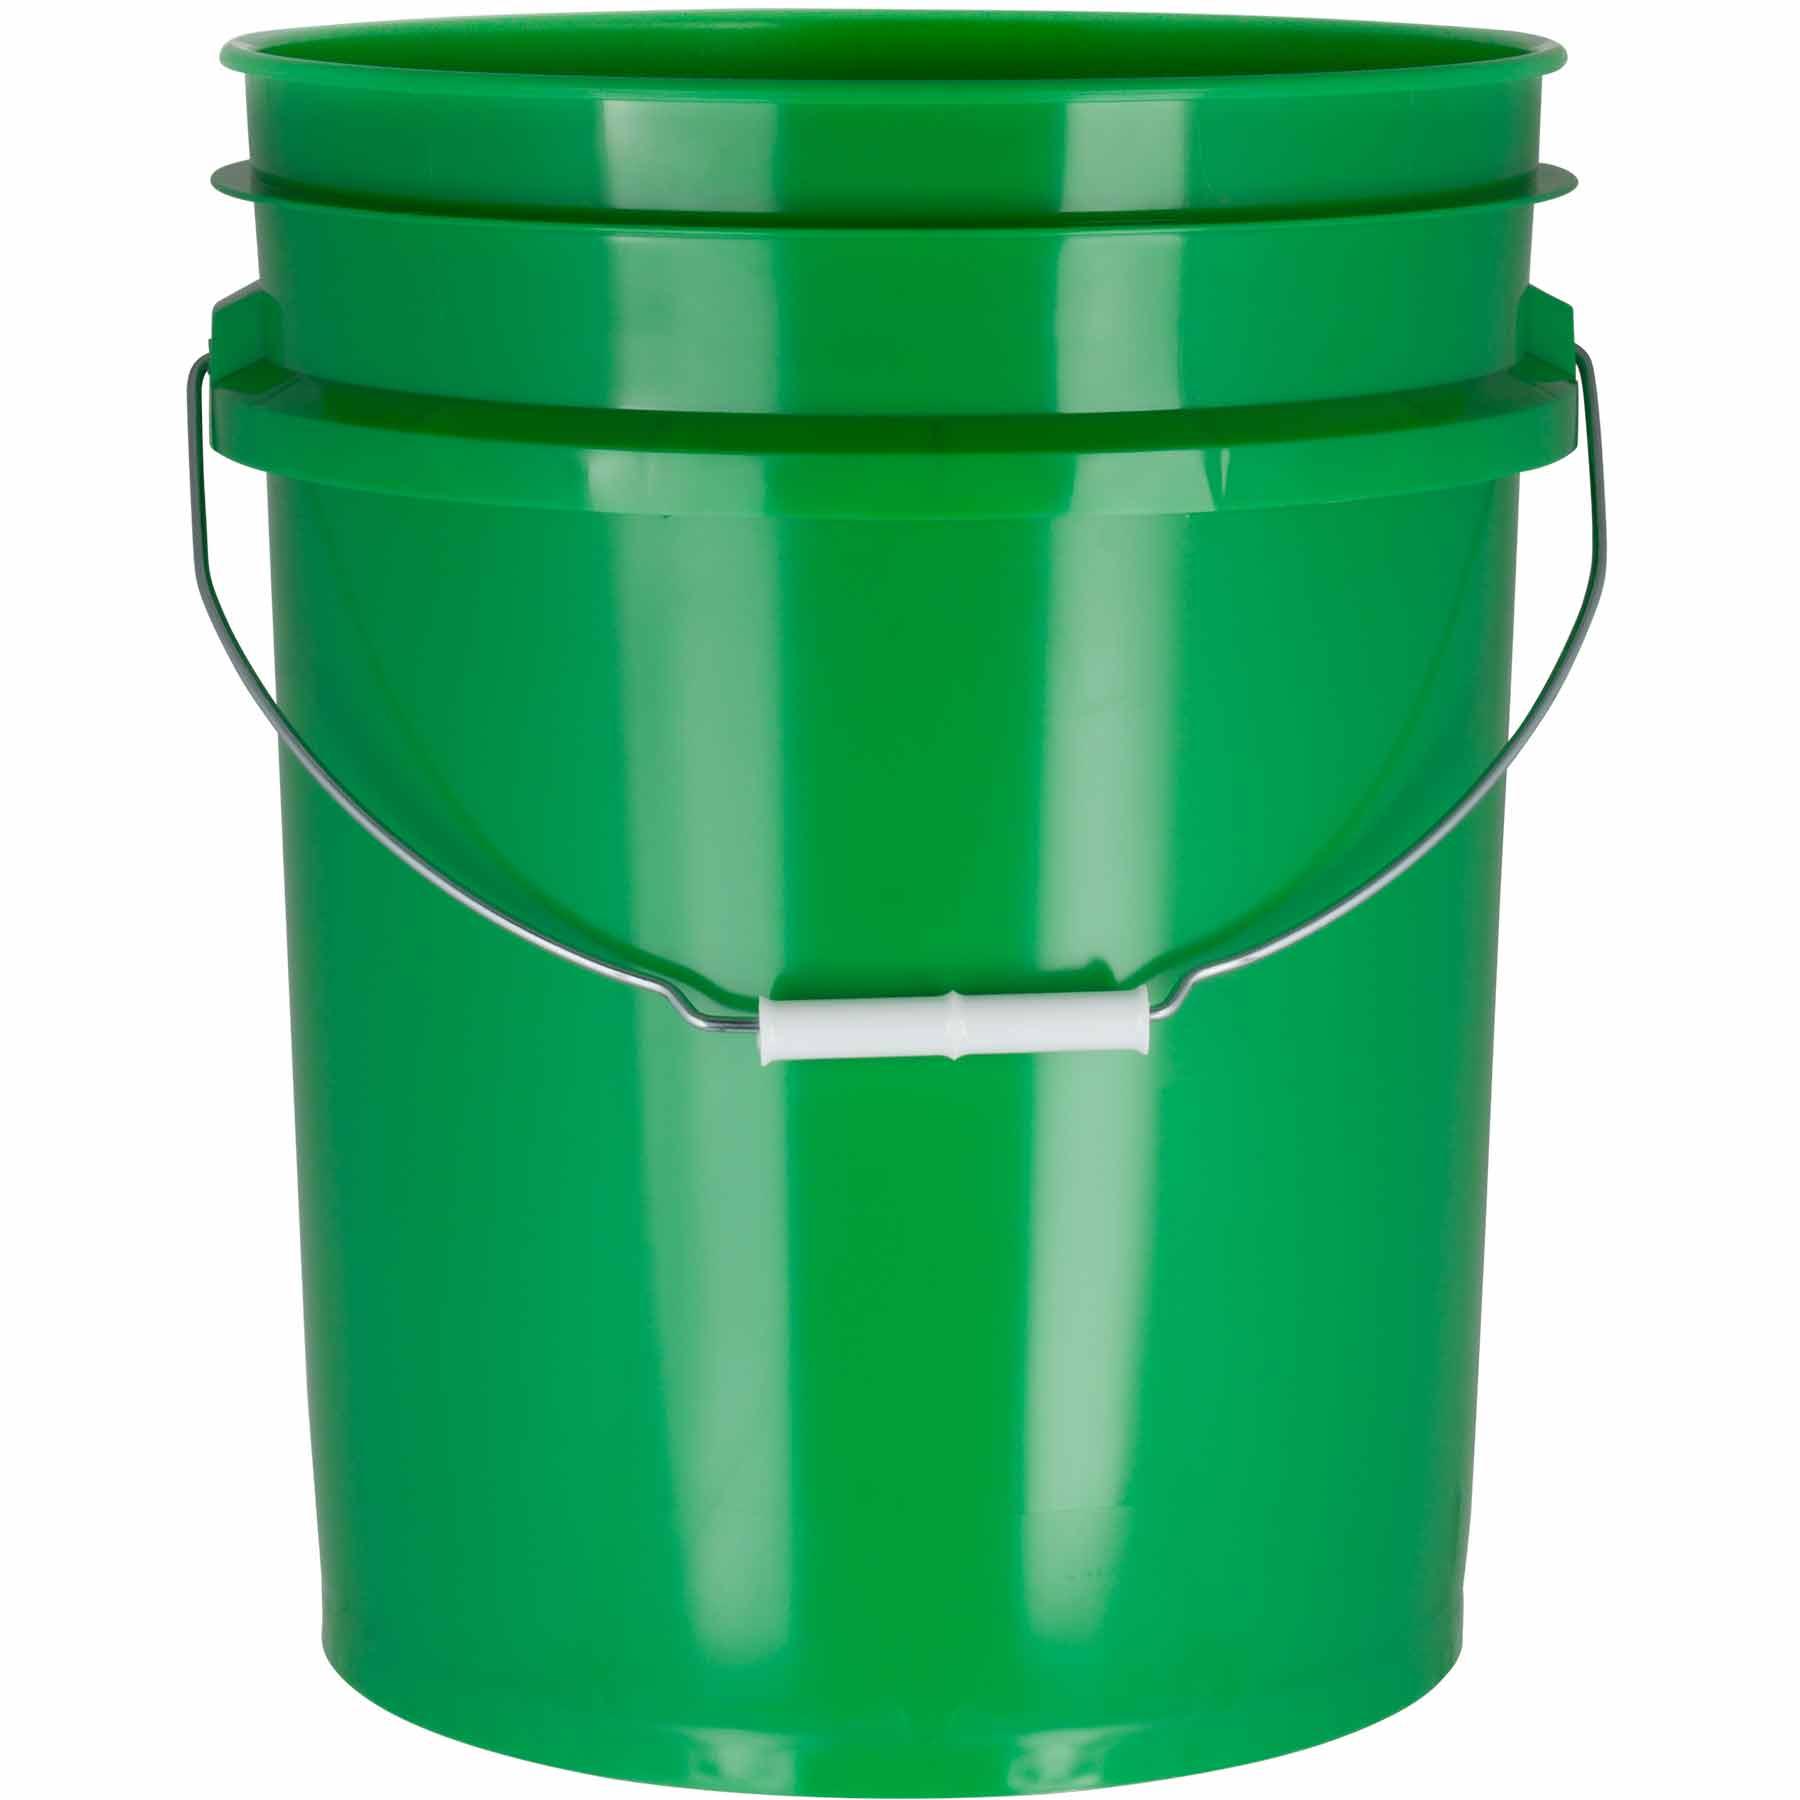 5 Gallon Green Plastic Pail 90 Mil W Metal Handle